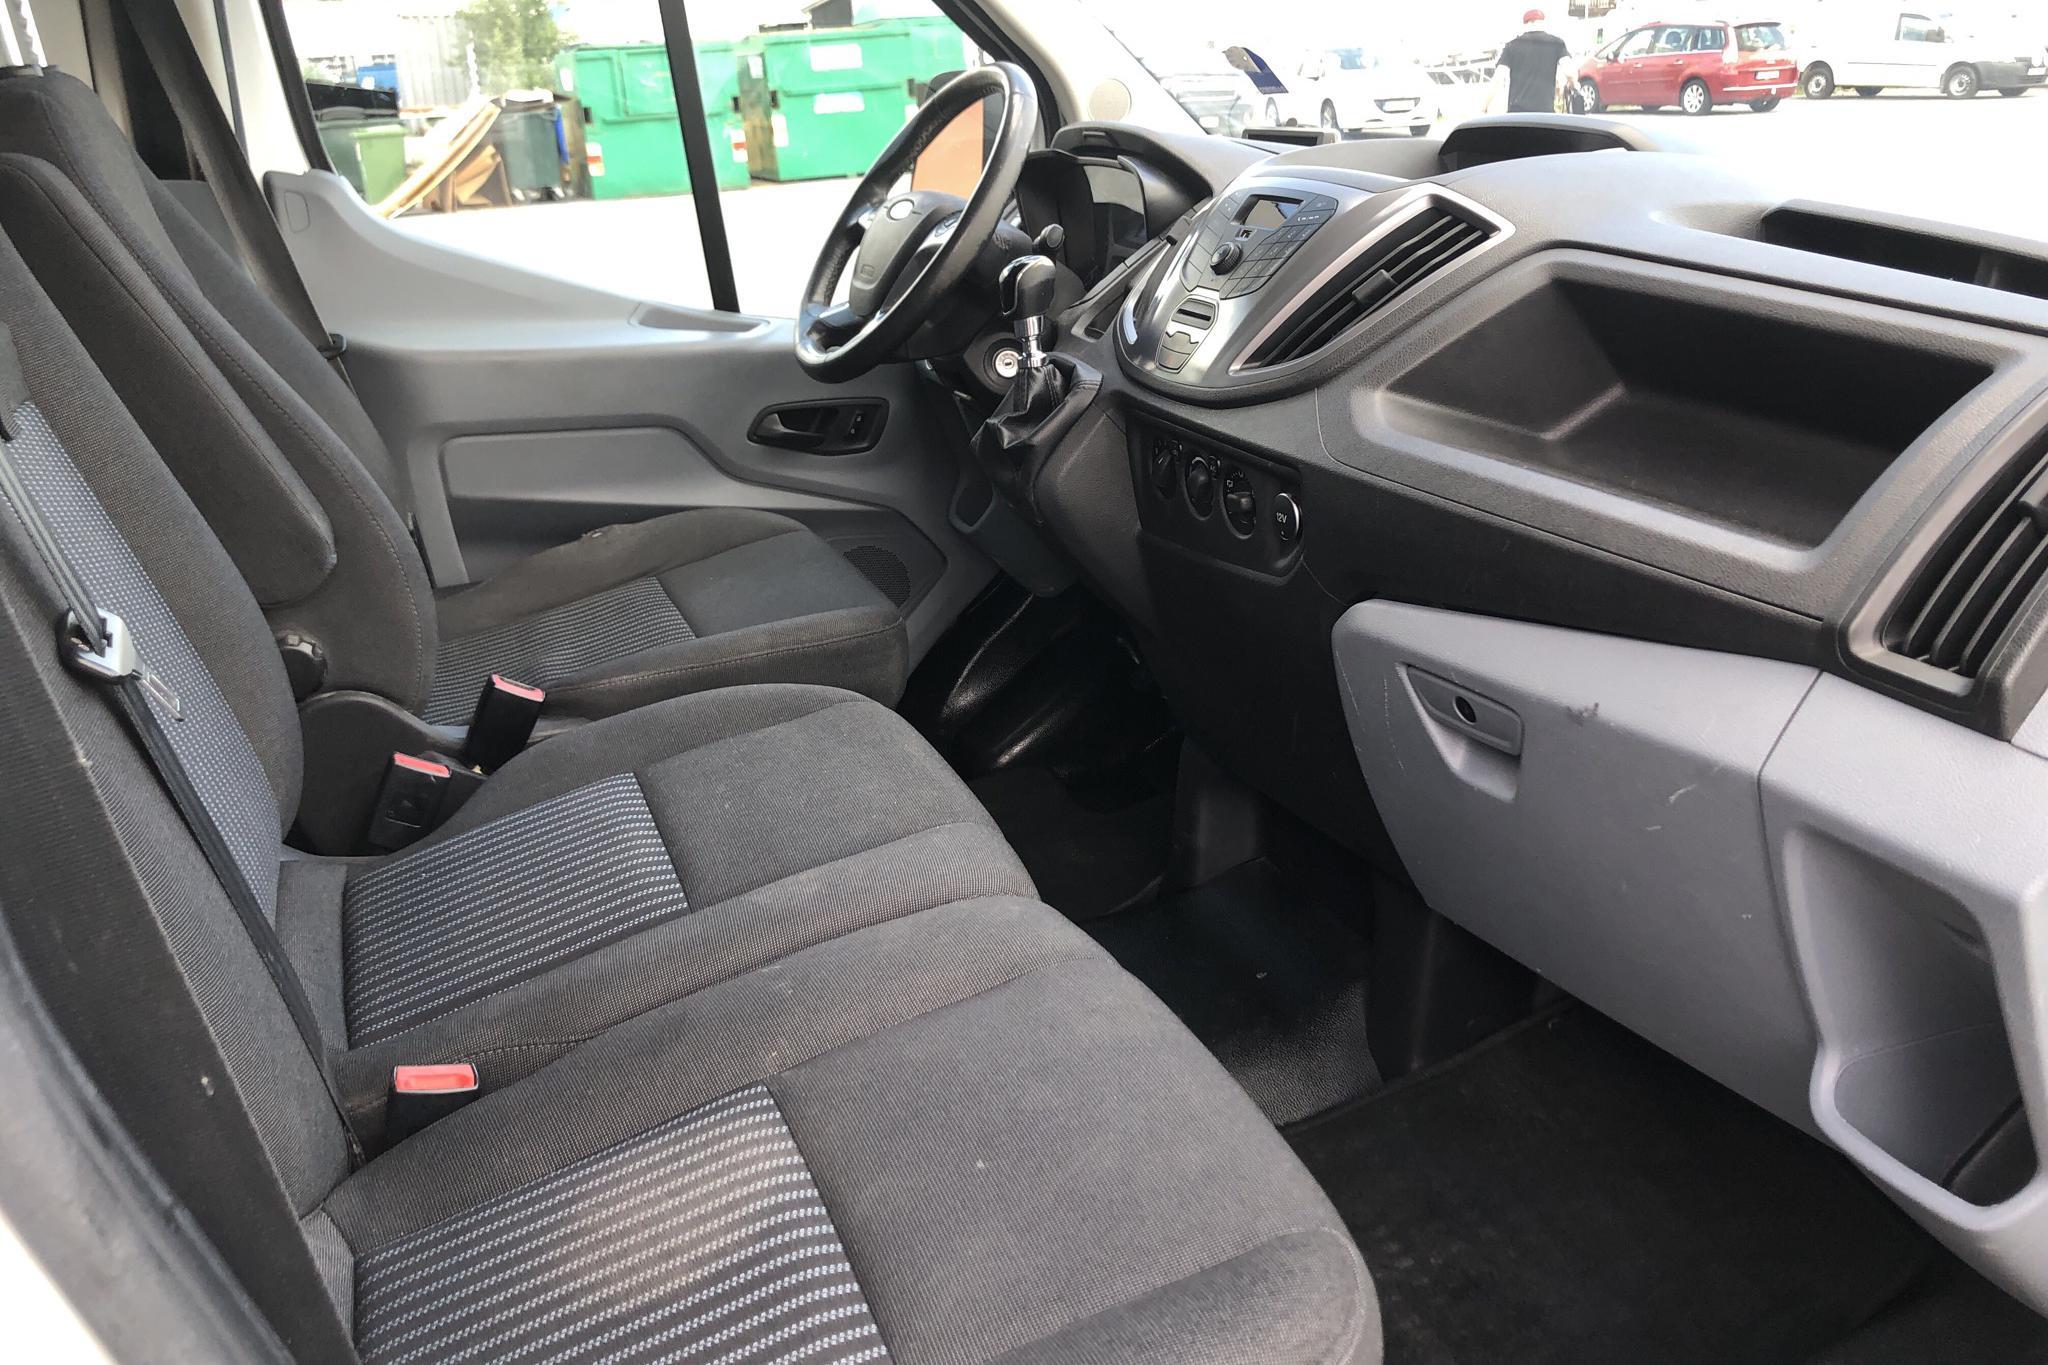 Ford Transit 350 2.2 TDCi Skåp 2WD (125hk) - 15 902 mil - Manuell - vit - 2015